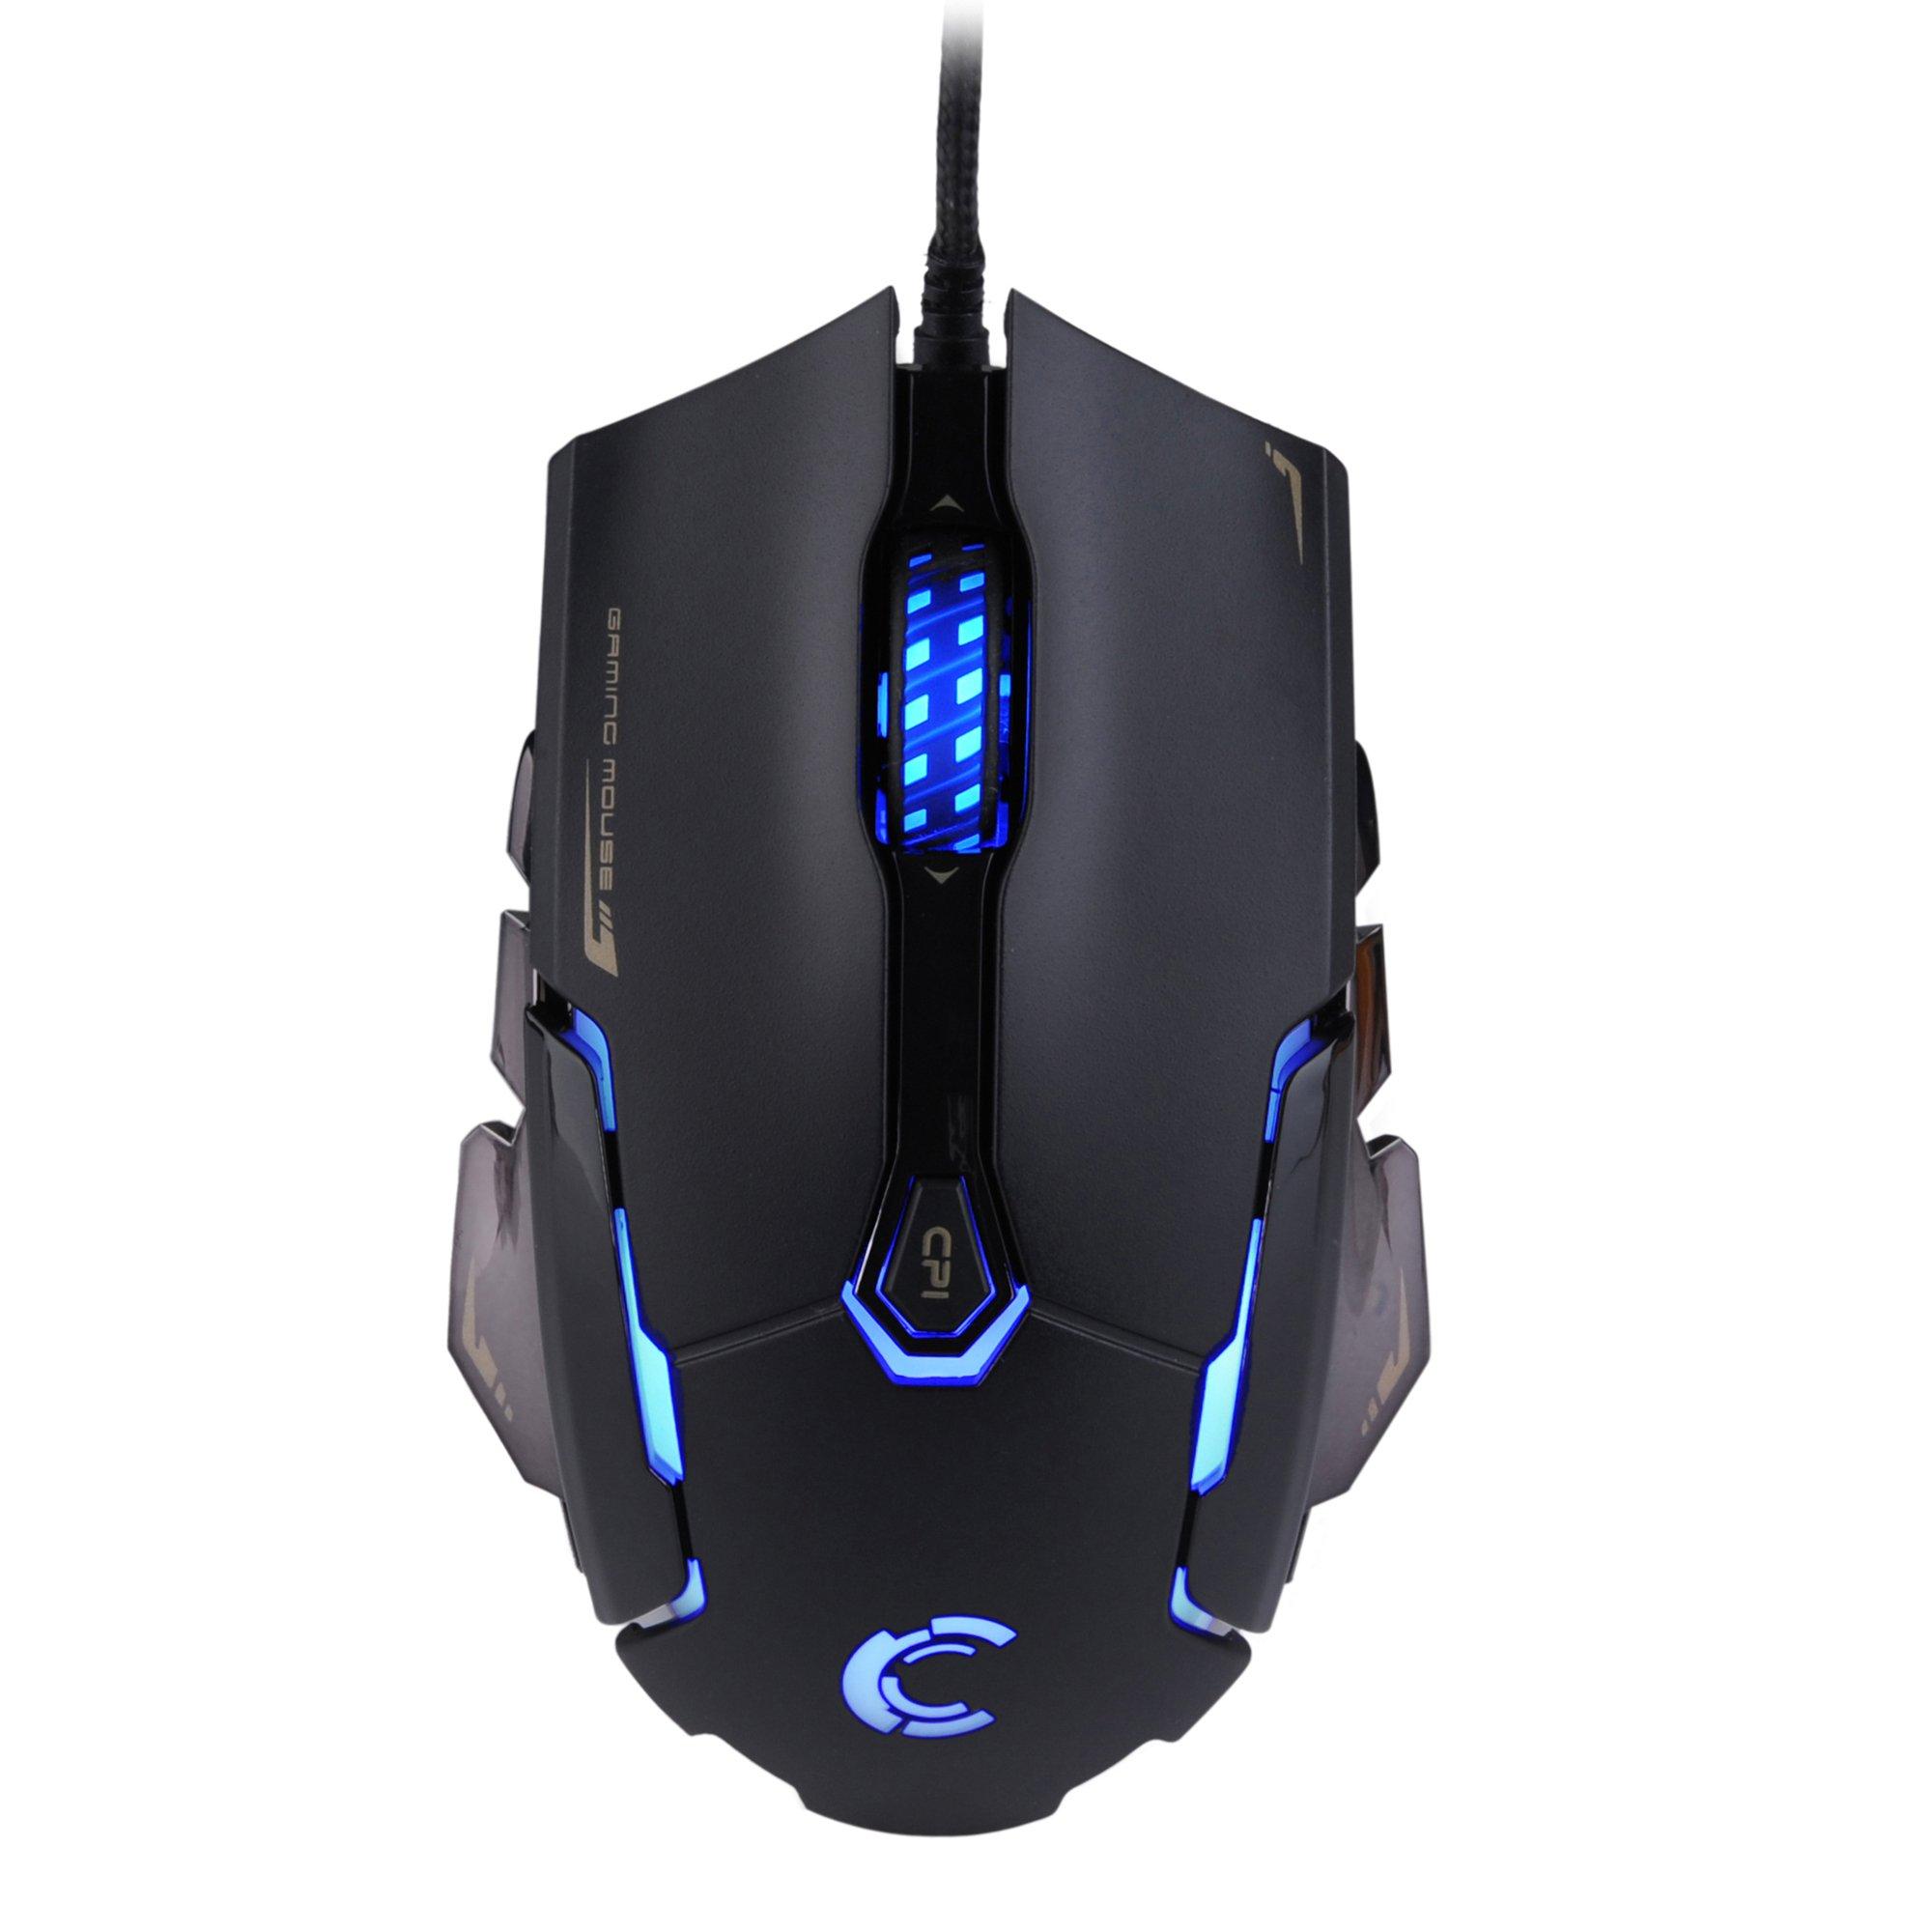 Mouse Gamer : Comanro DM004 LED Rainbow Breathing Color 6 Bo